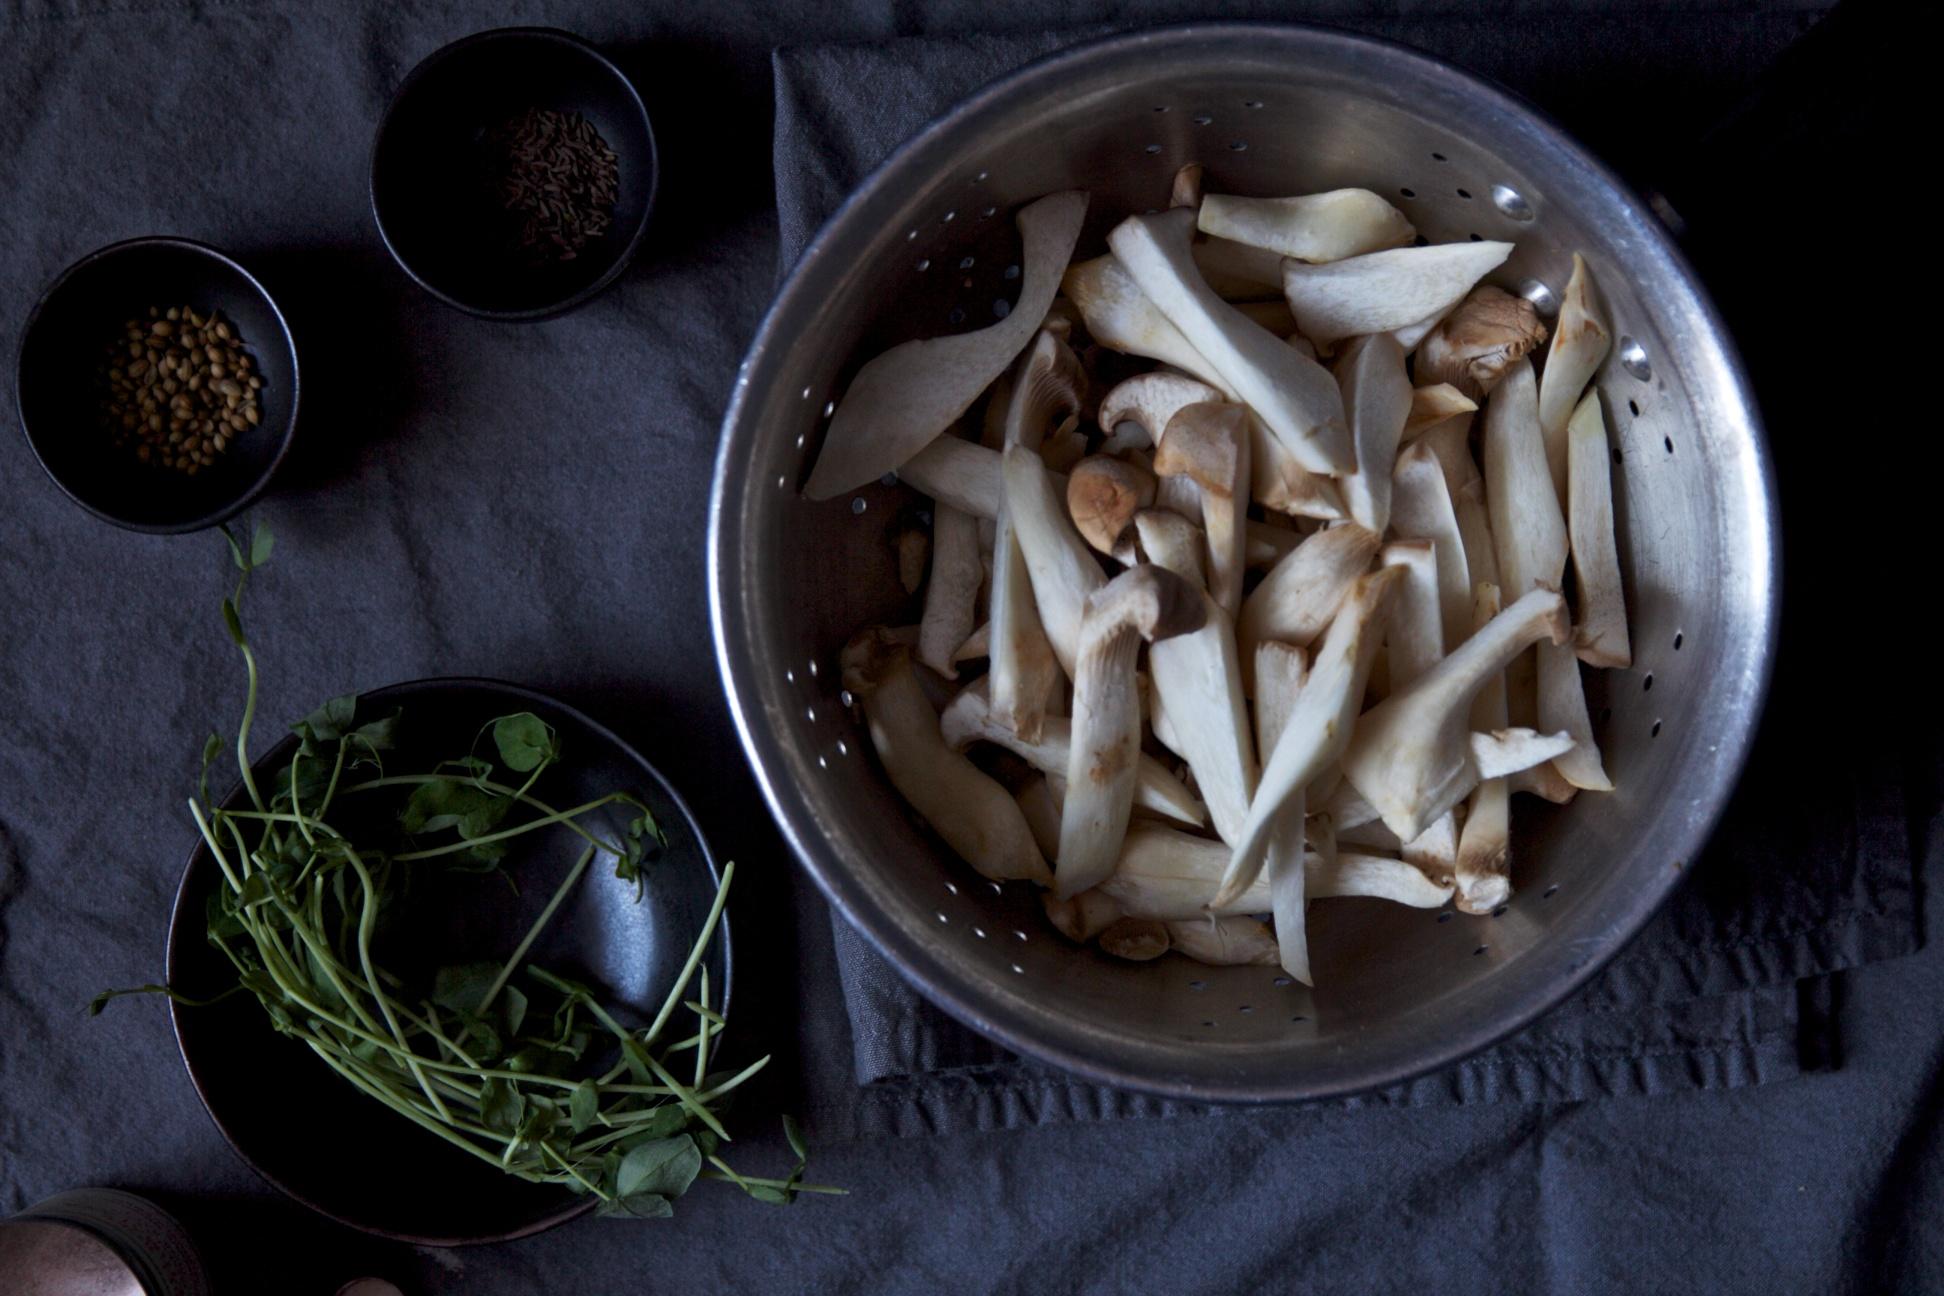 Leek + Mushroom Rice with Cashew Cream